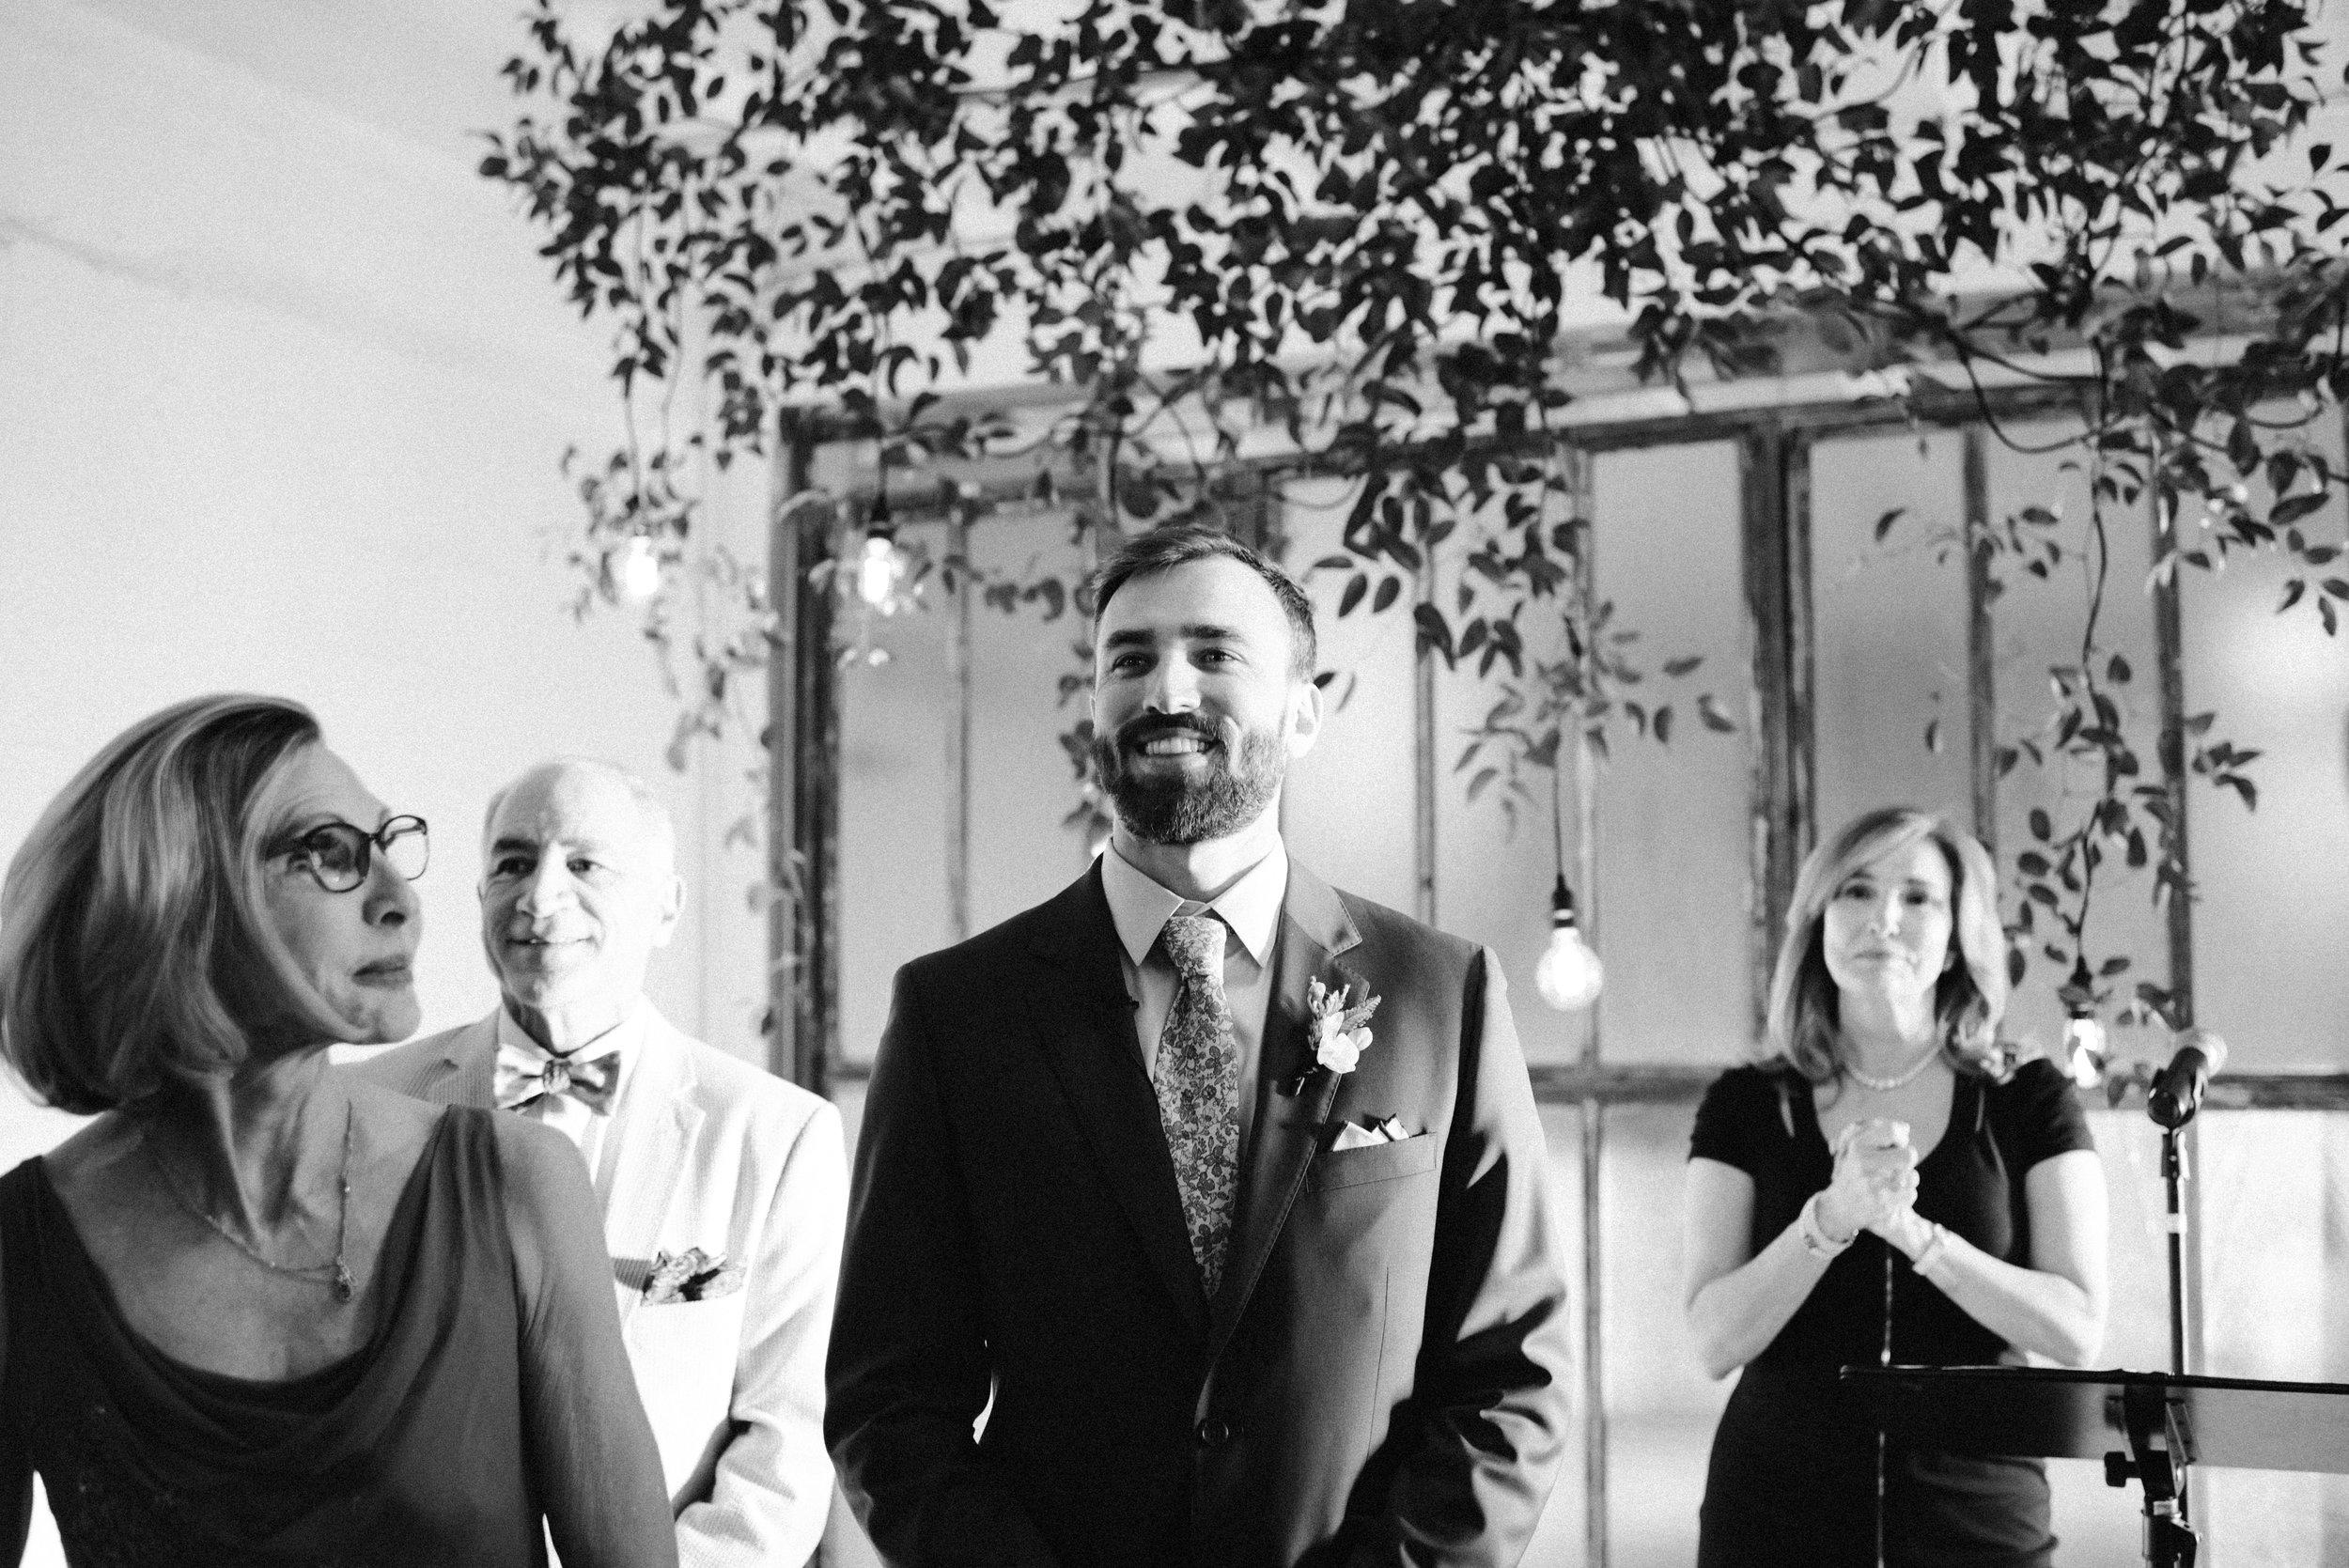 stephanie-bobby-ace-prop-house-miami-florida-wedding-749.jpg